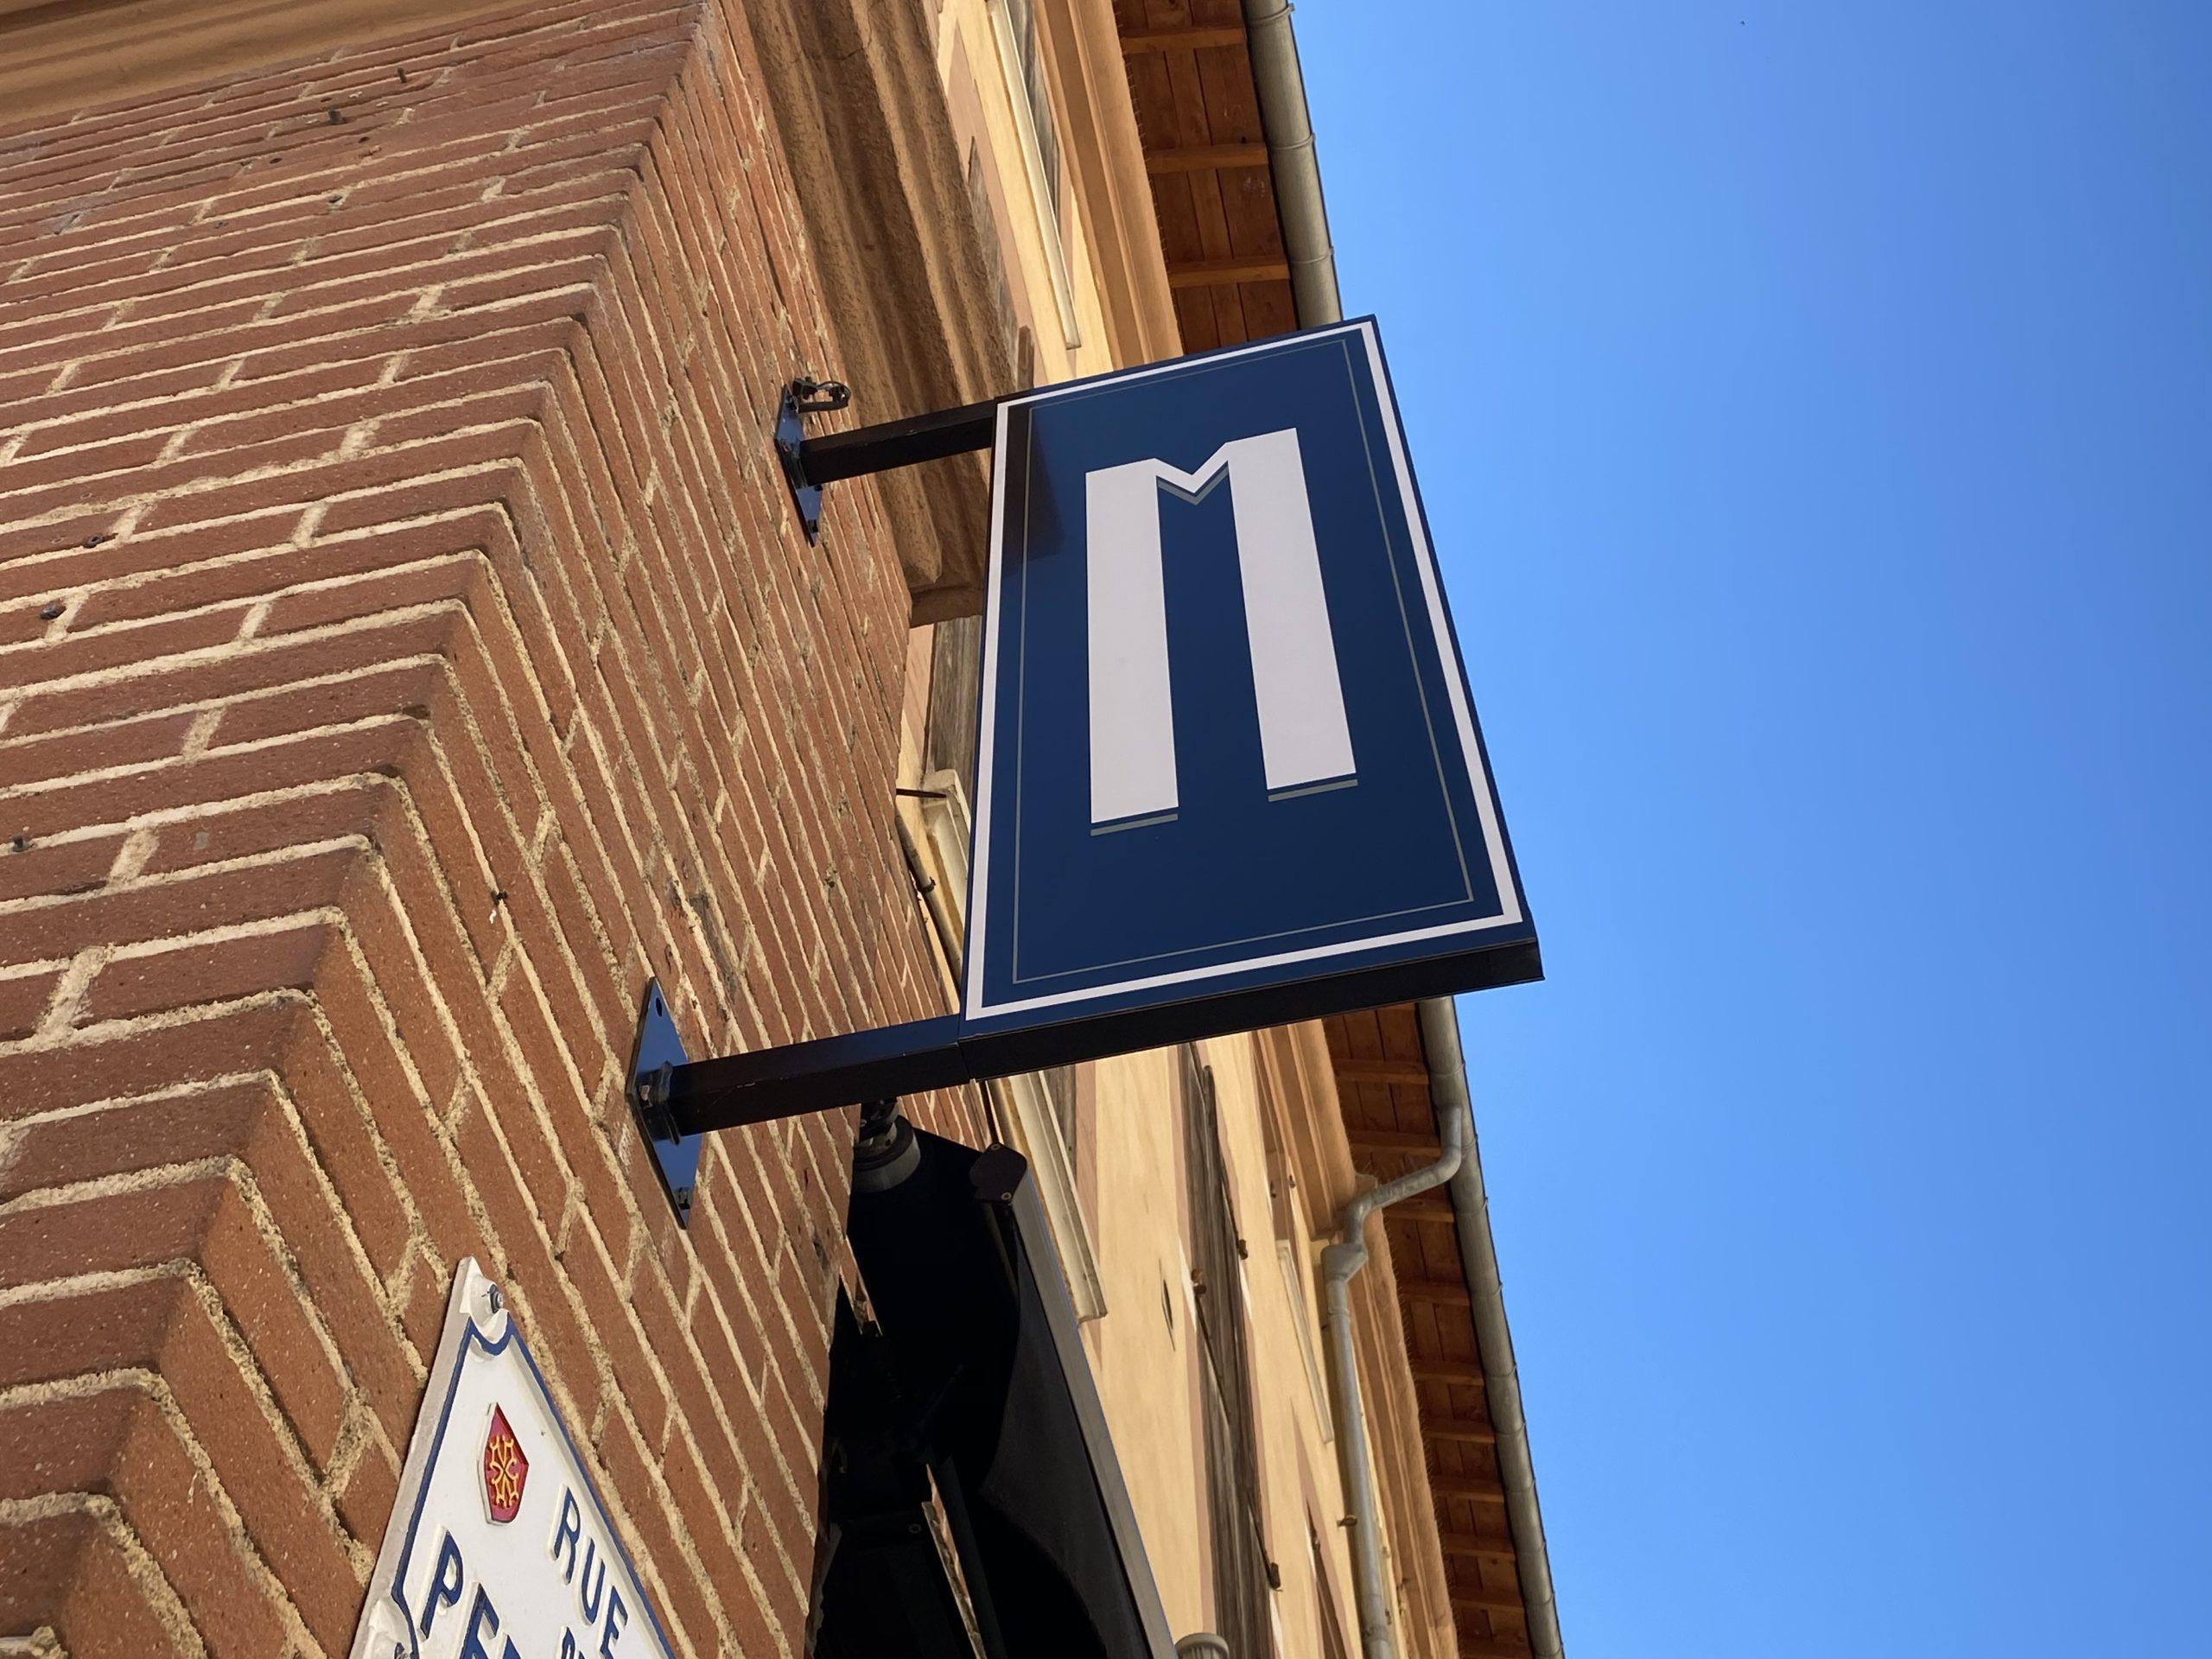 Enseigne Toulouse perpendiculaire restaurant